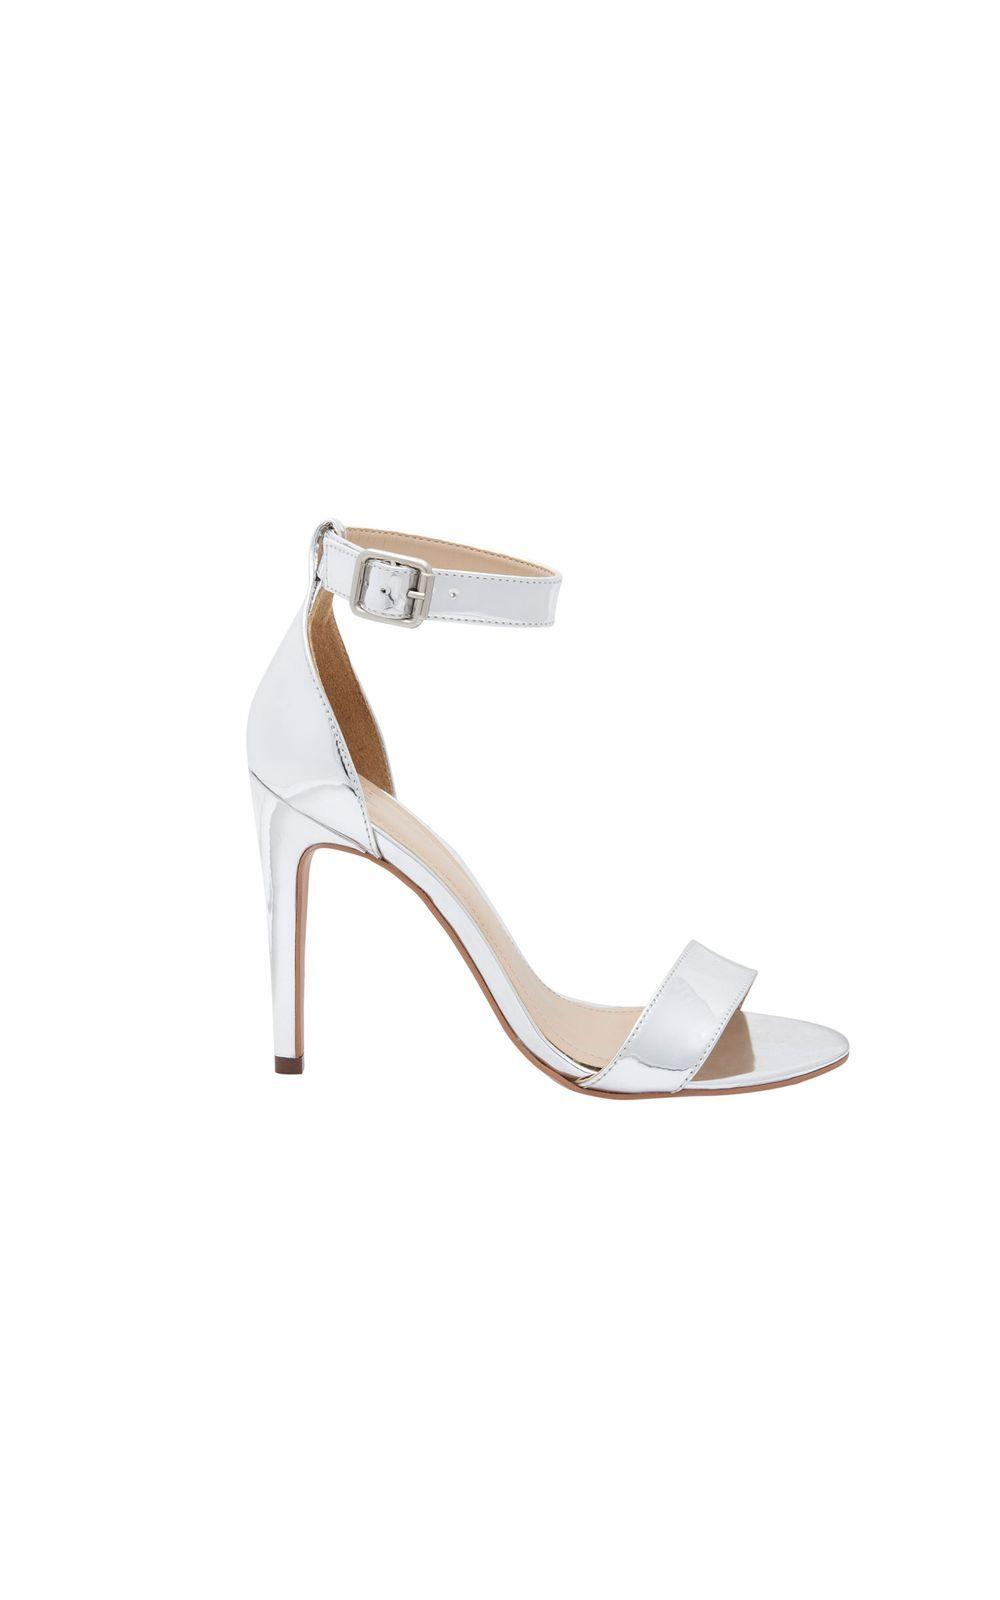 6634b8f5c Sandália festa prata em 2019 | Réveillon | Sandals, Shoes e Fashion